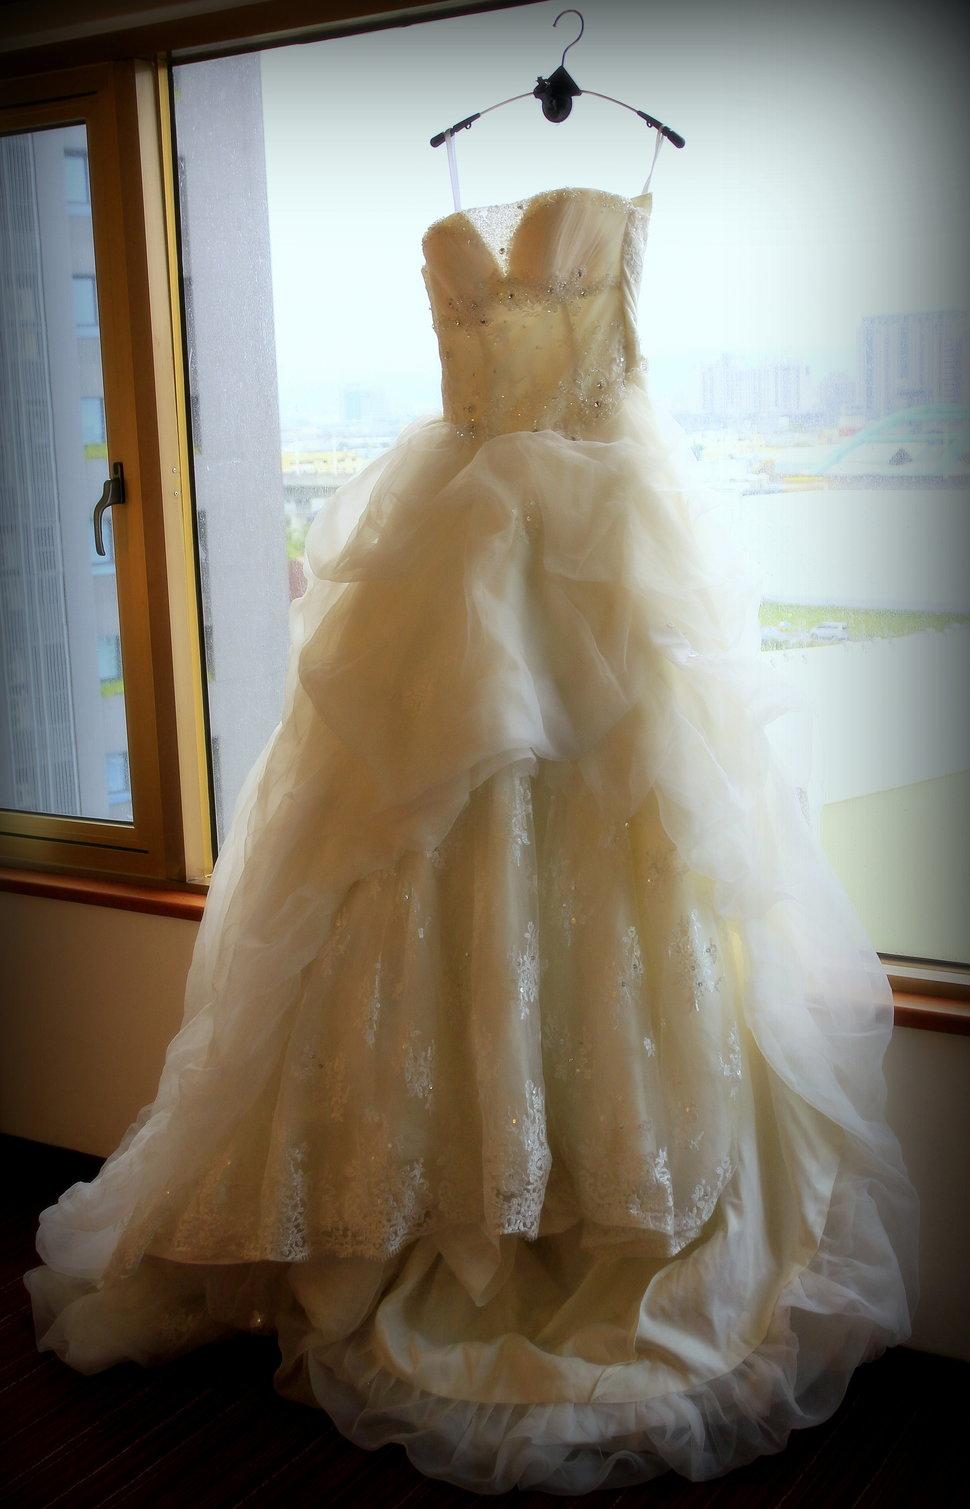 _MG_9335 - Yusin 攝影~與您同心祝福您永結同心 - 結婚吧